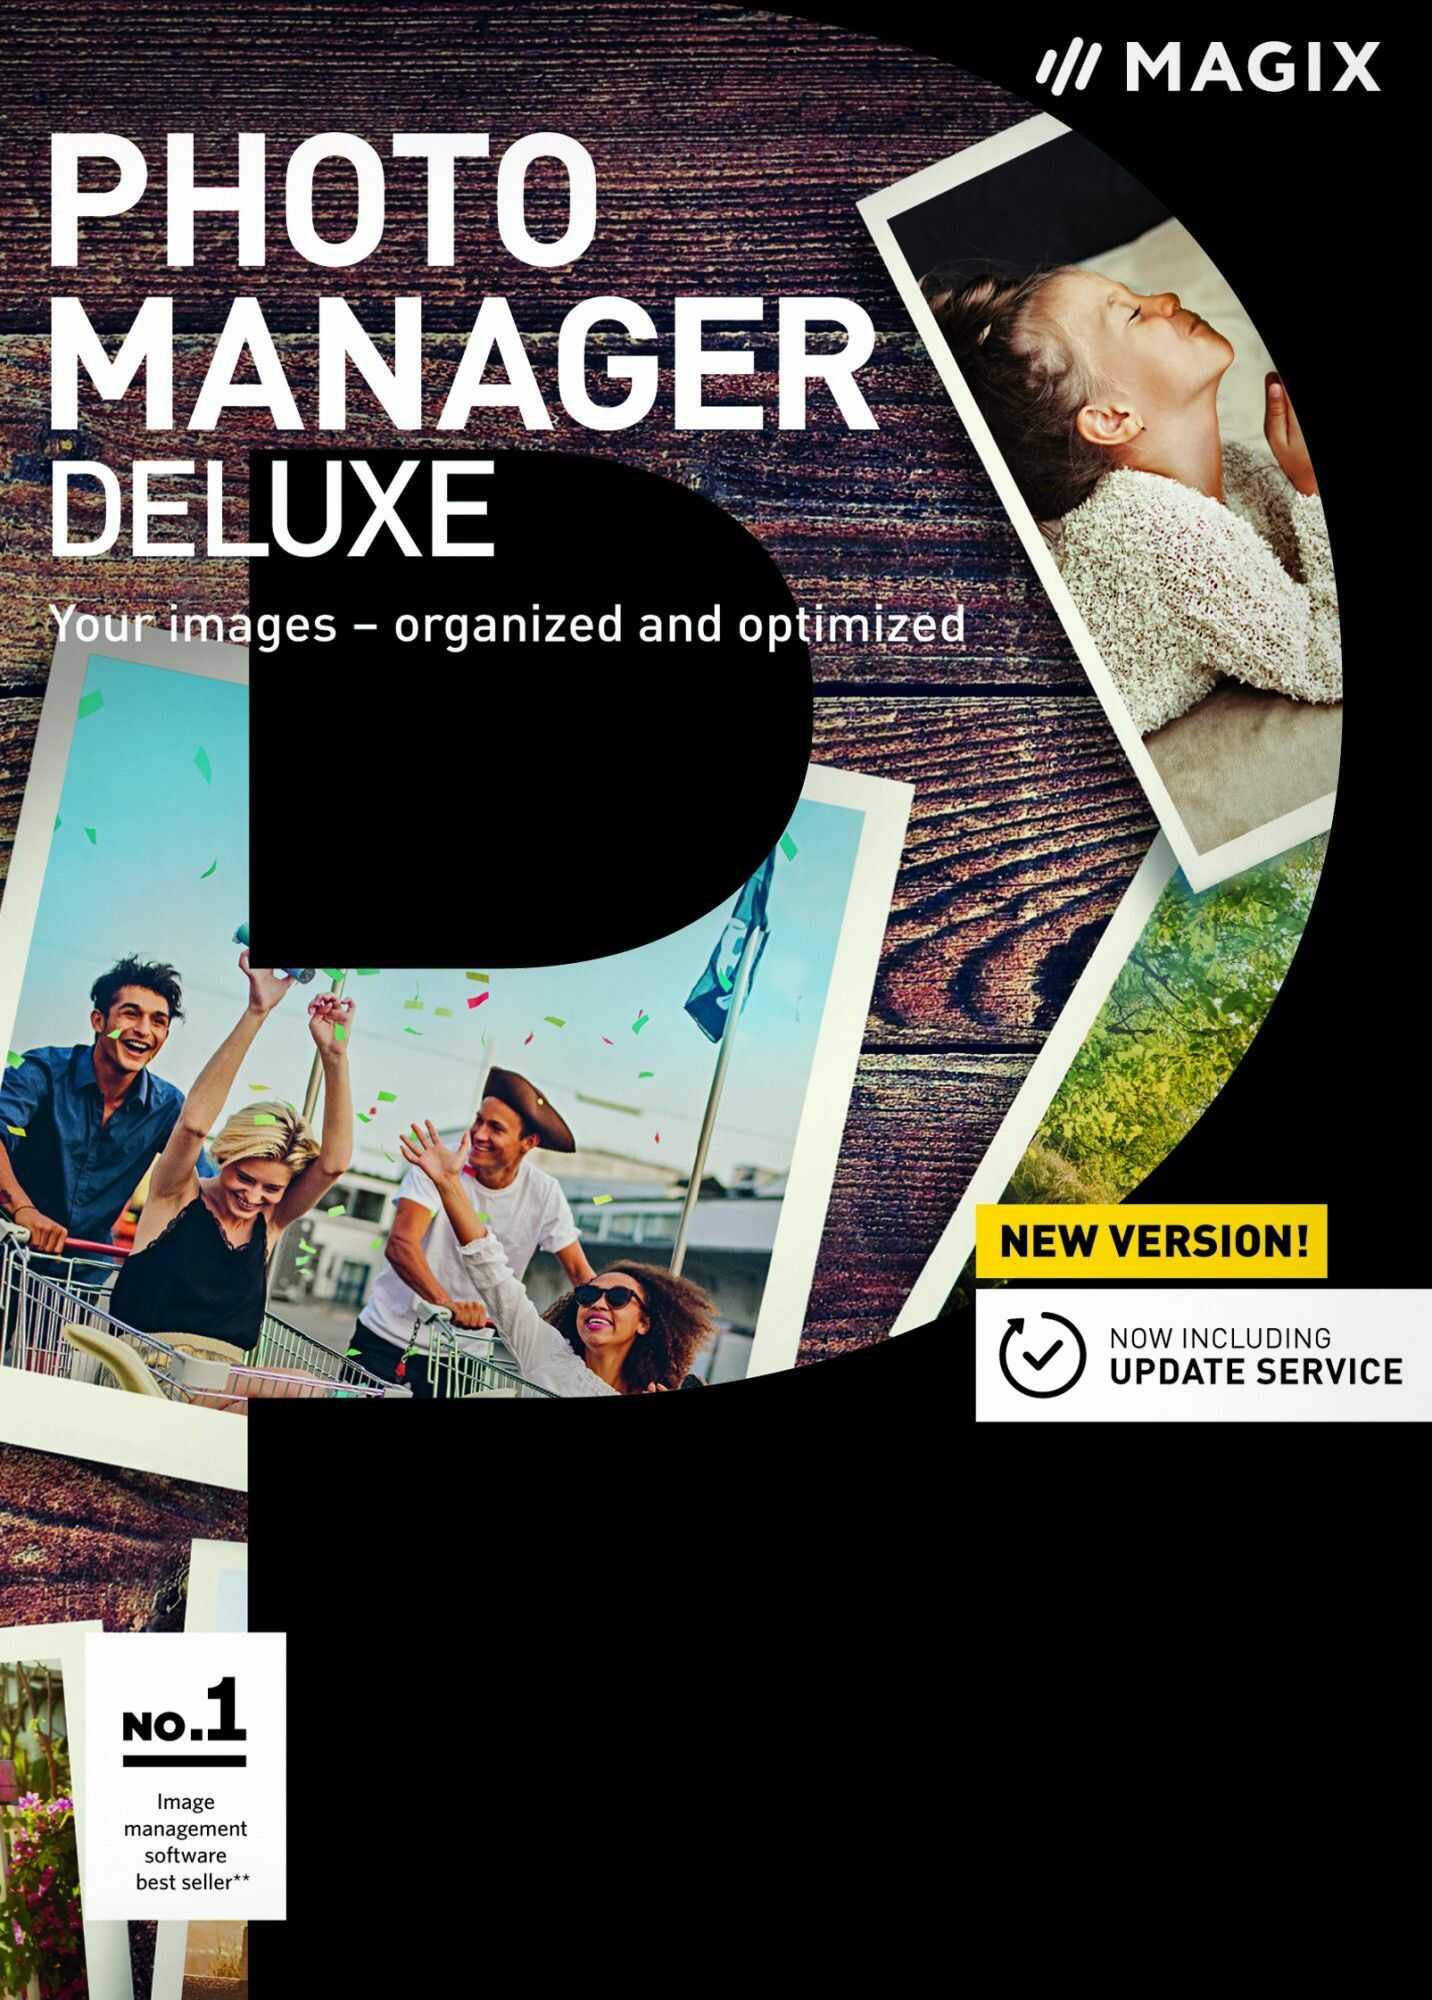 MAGIX Photo Manager Deluxe - ESD - Edu - Certyfikaty Rzetelna Firma i Adobe Gold Reseller